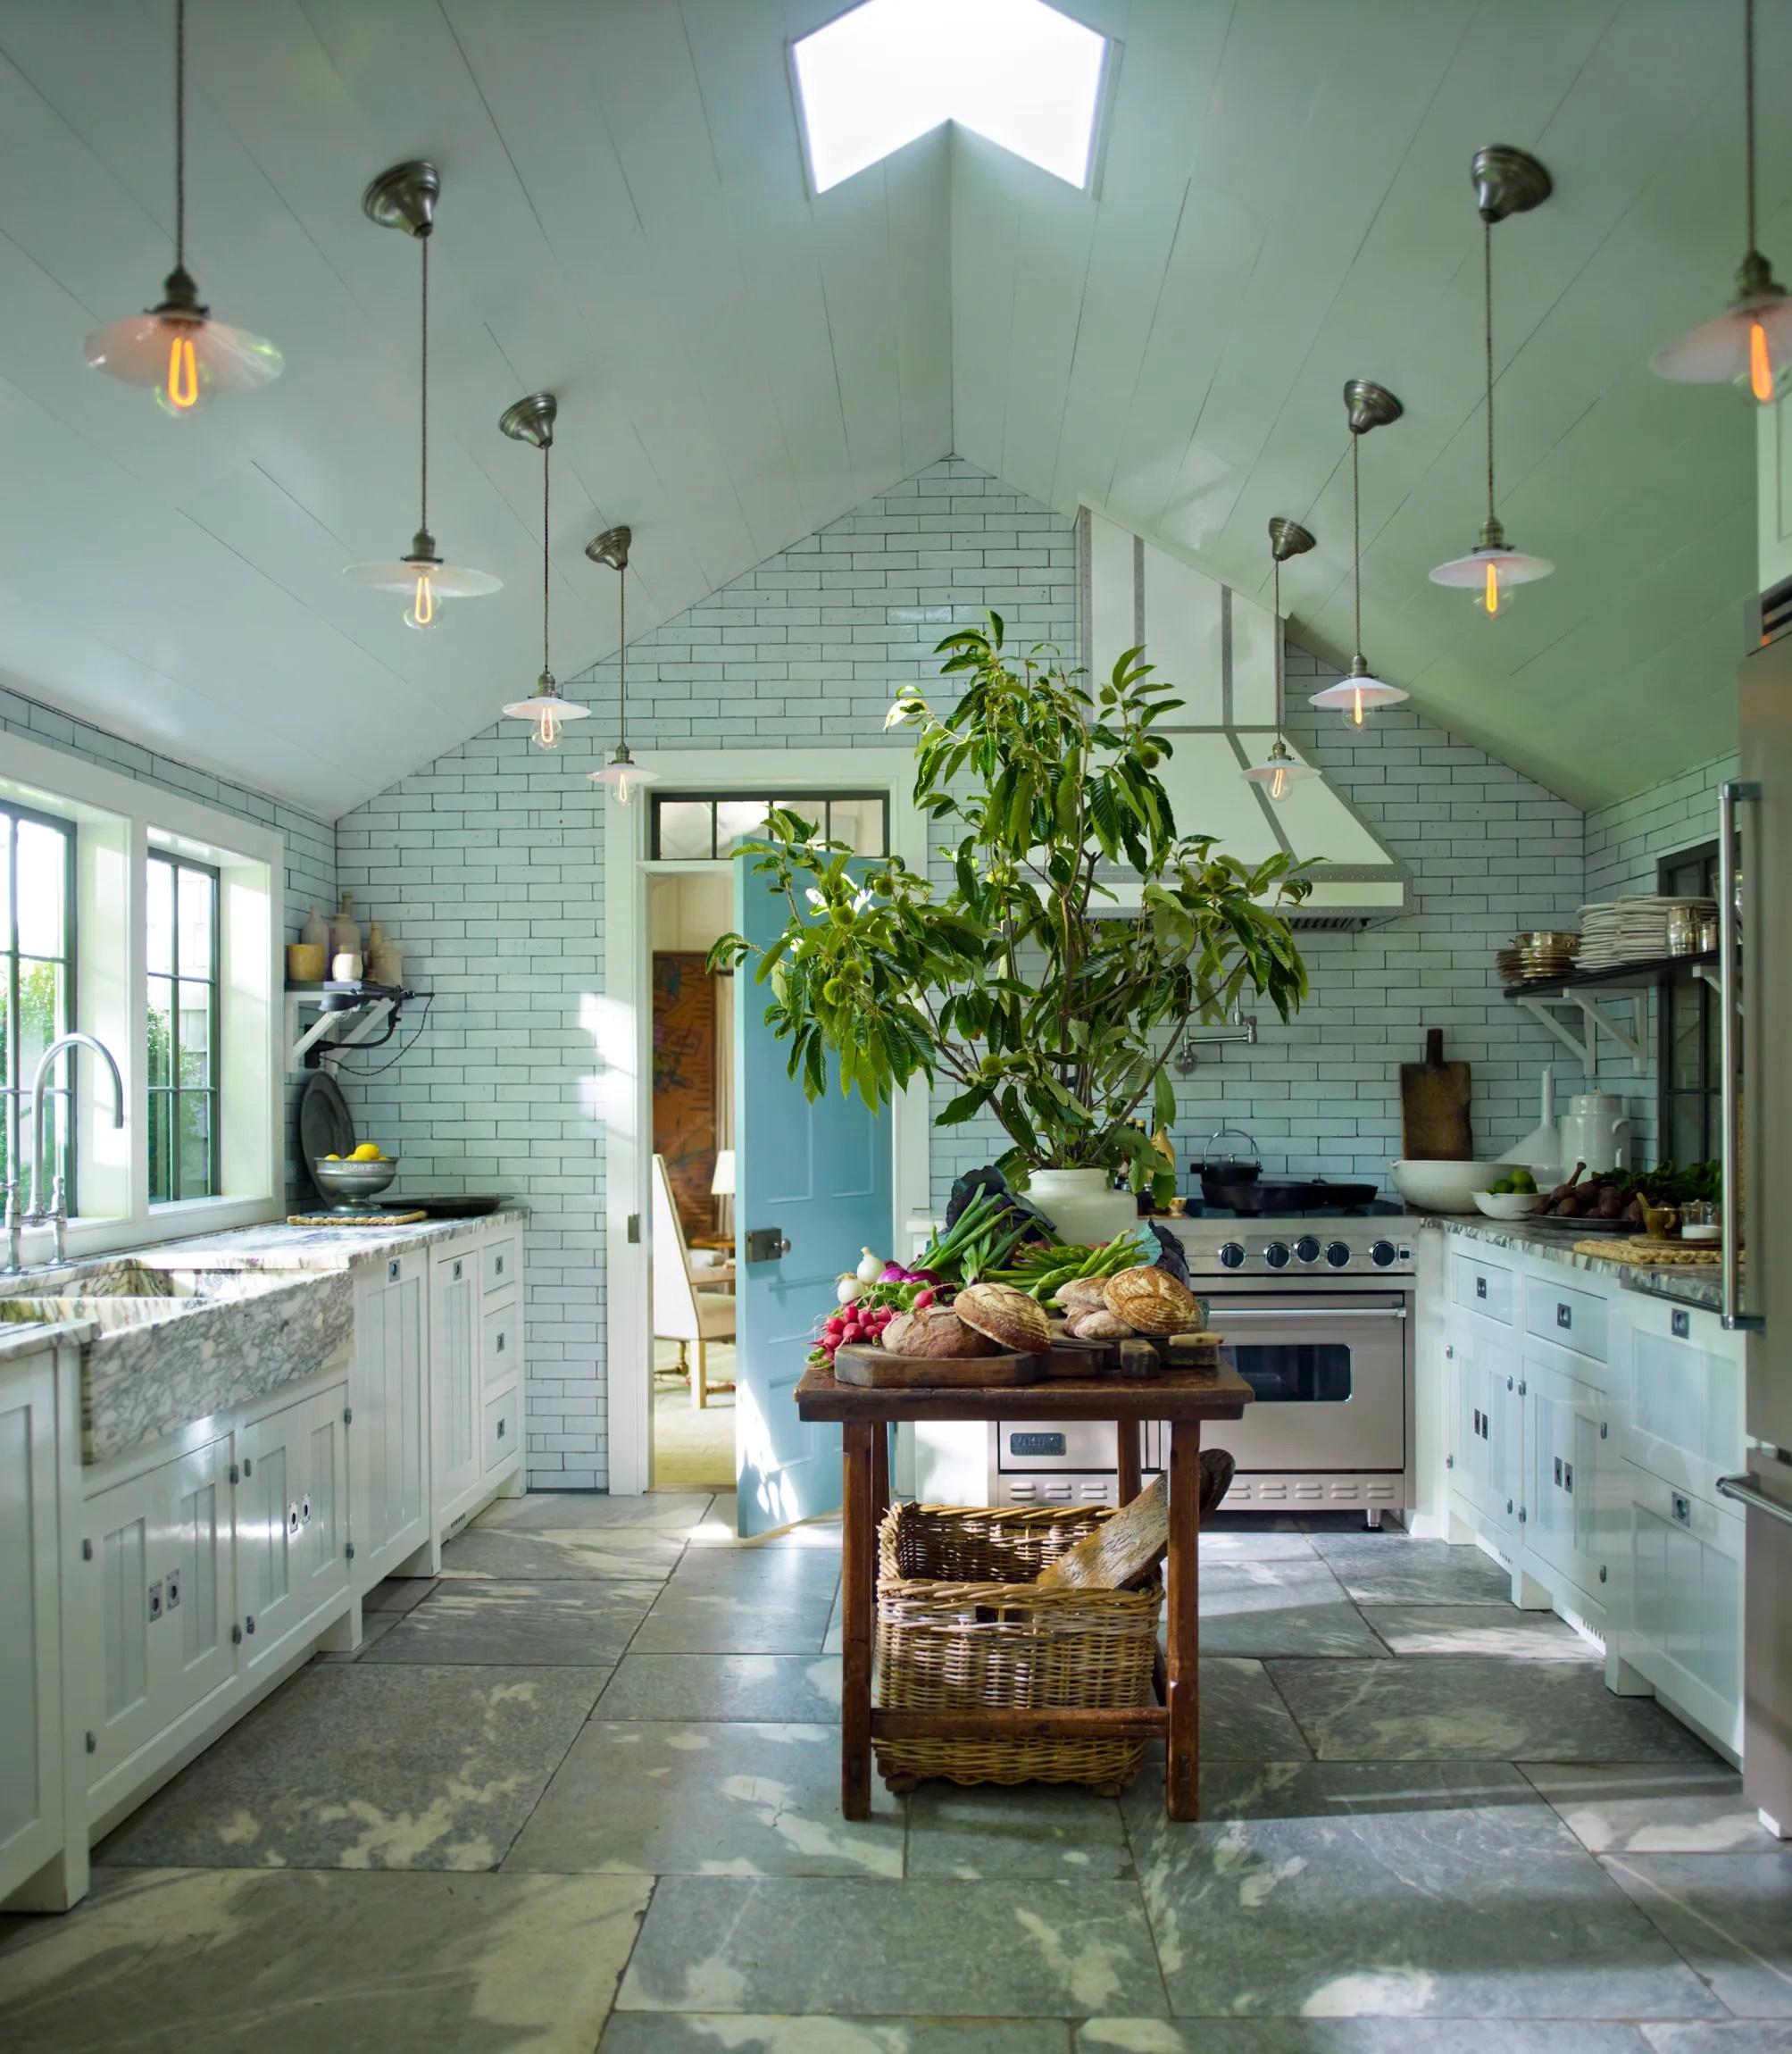 kitchen designs trash can sizes renovation guide design ideas architectural digest designer steven gambrel s 8 favorite